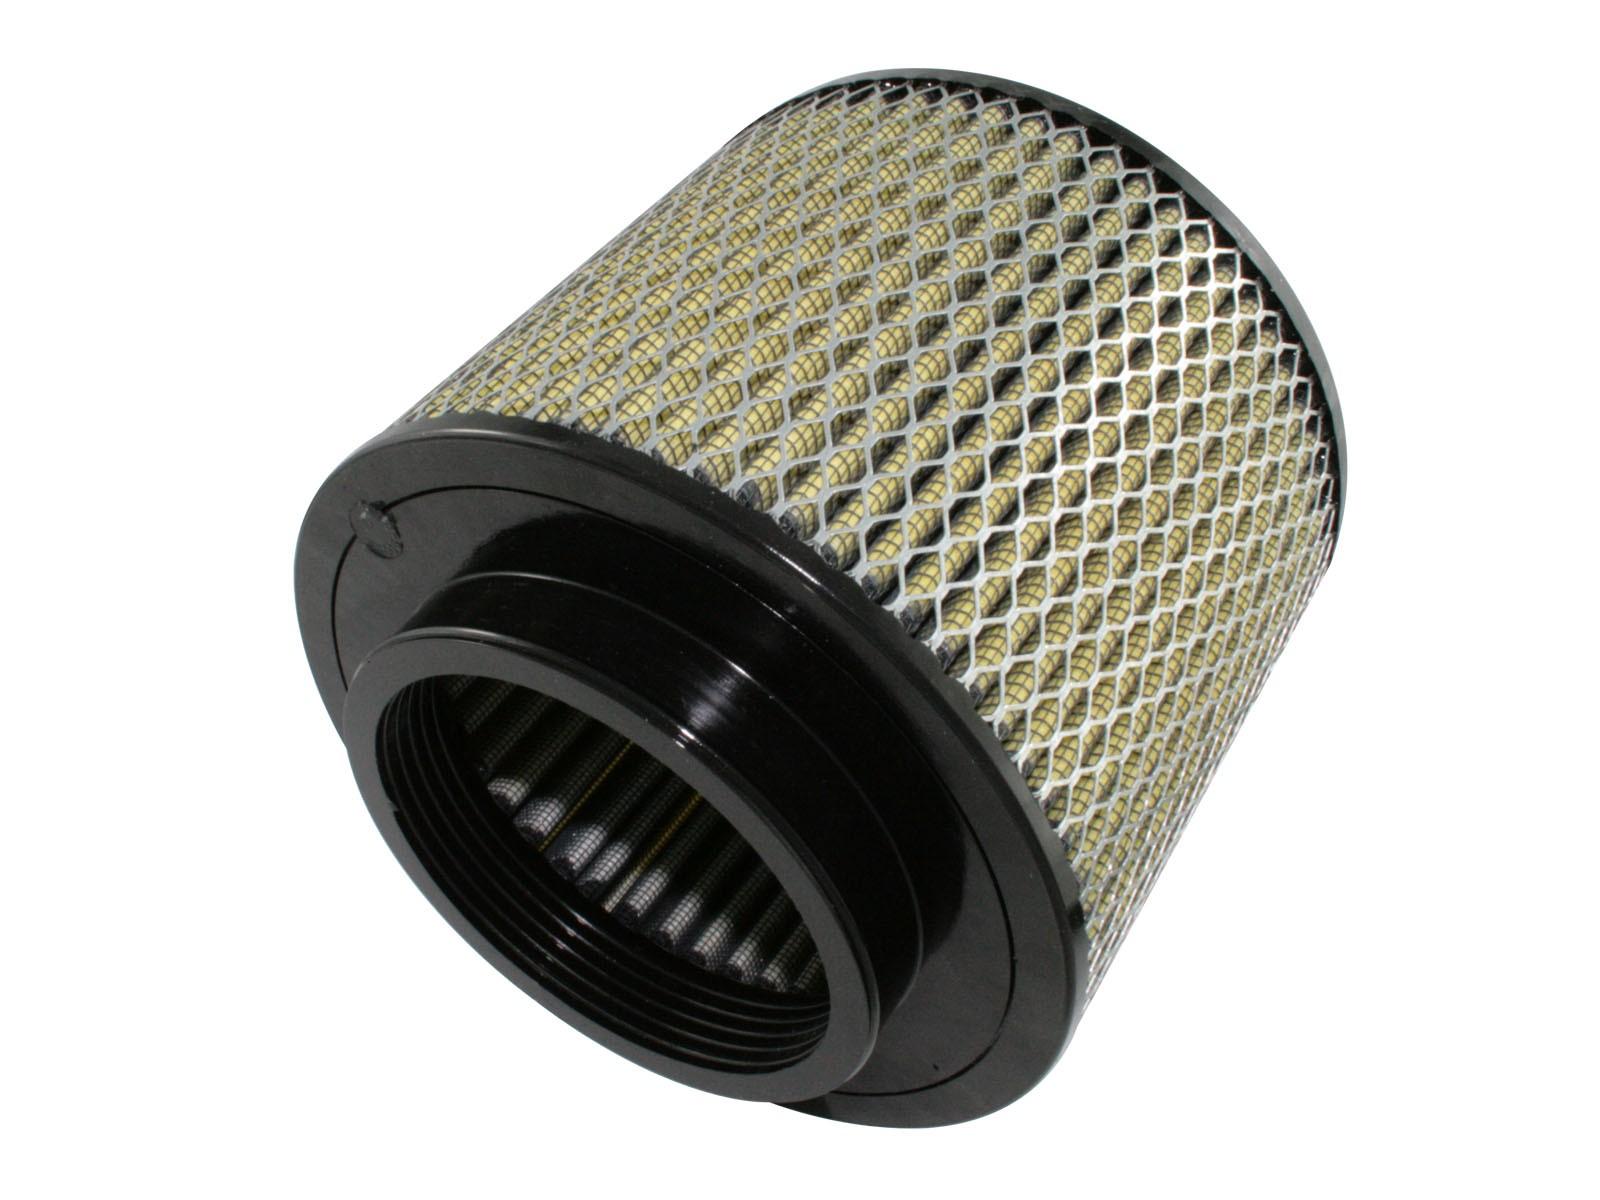 aFe POWER 72-90055 Magnum FLOW Pro GUARD7 Air Filter